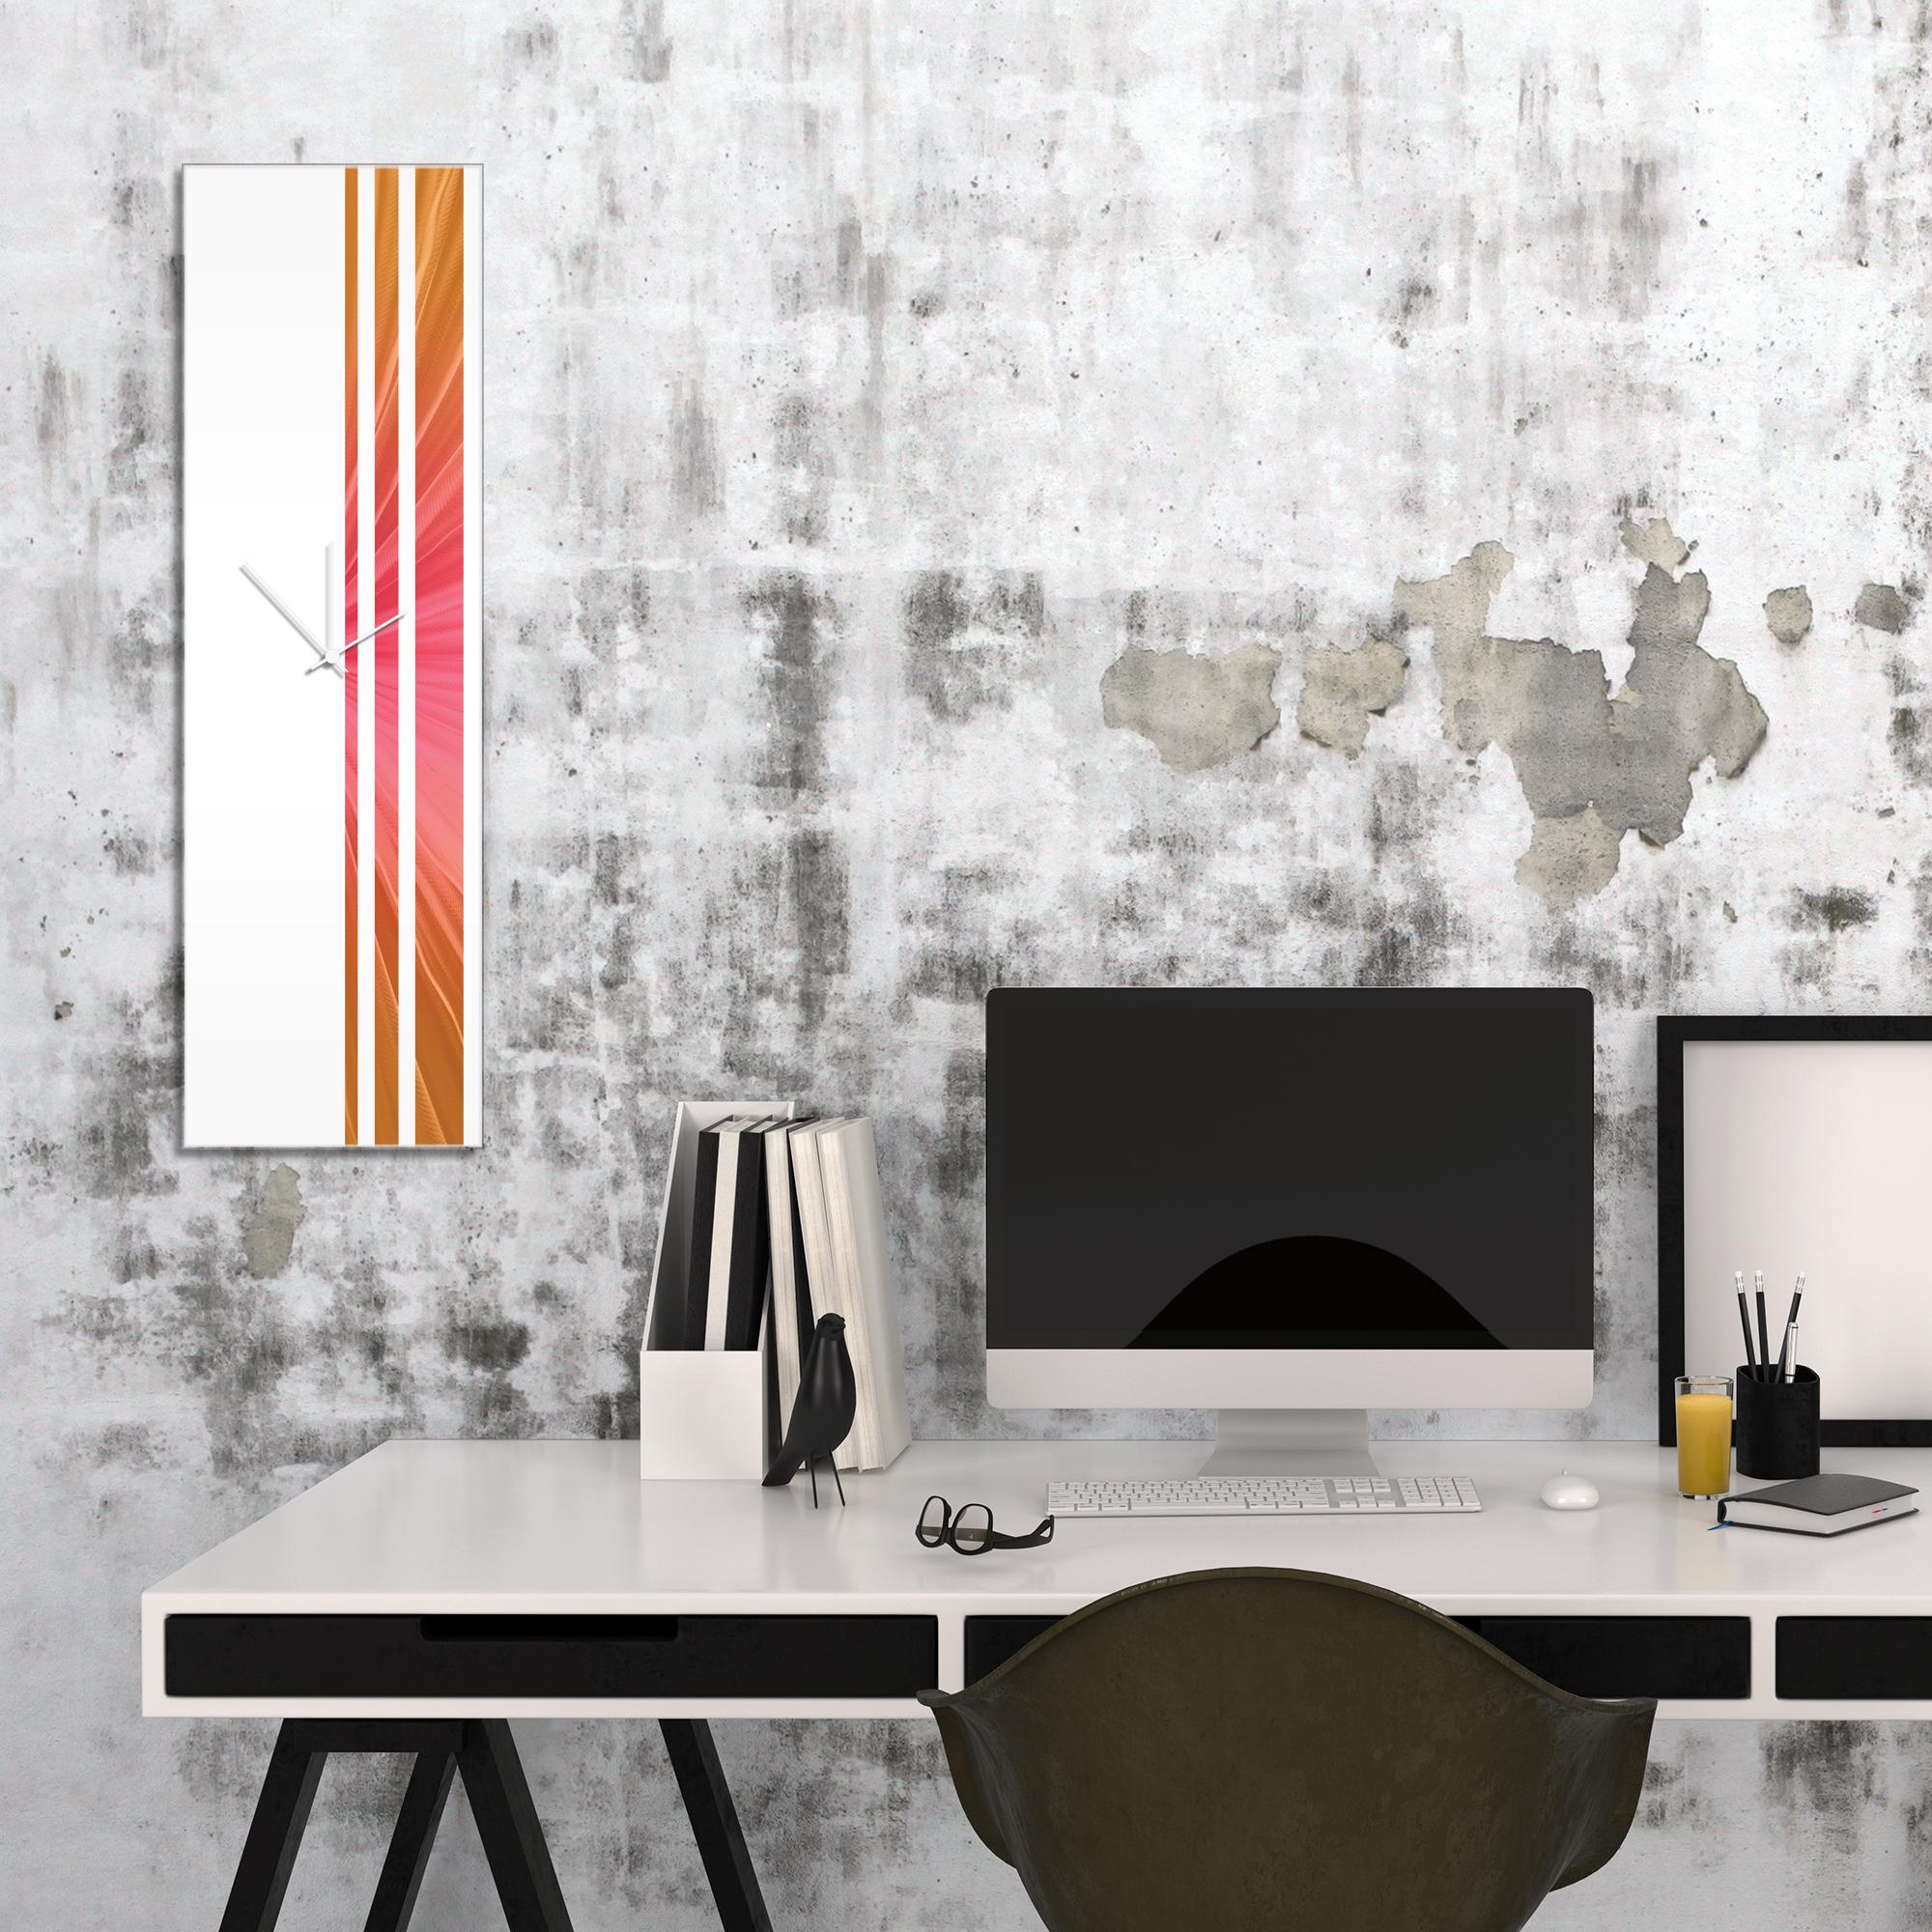 Autumn Triple Stripe Clock by Adam Schwoeppe Large Modern Clock on Acrylic - Alternate View 1